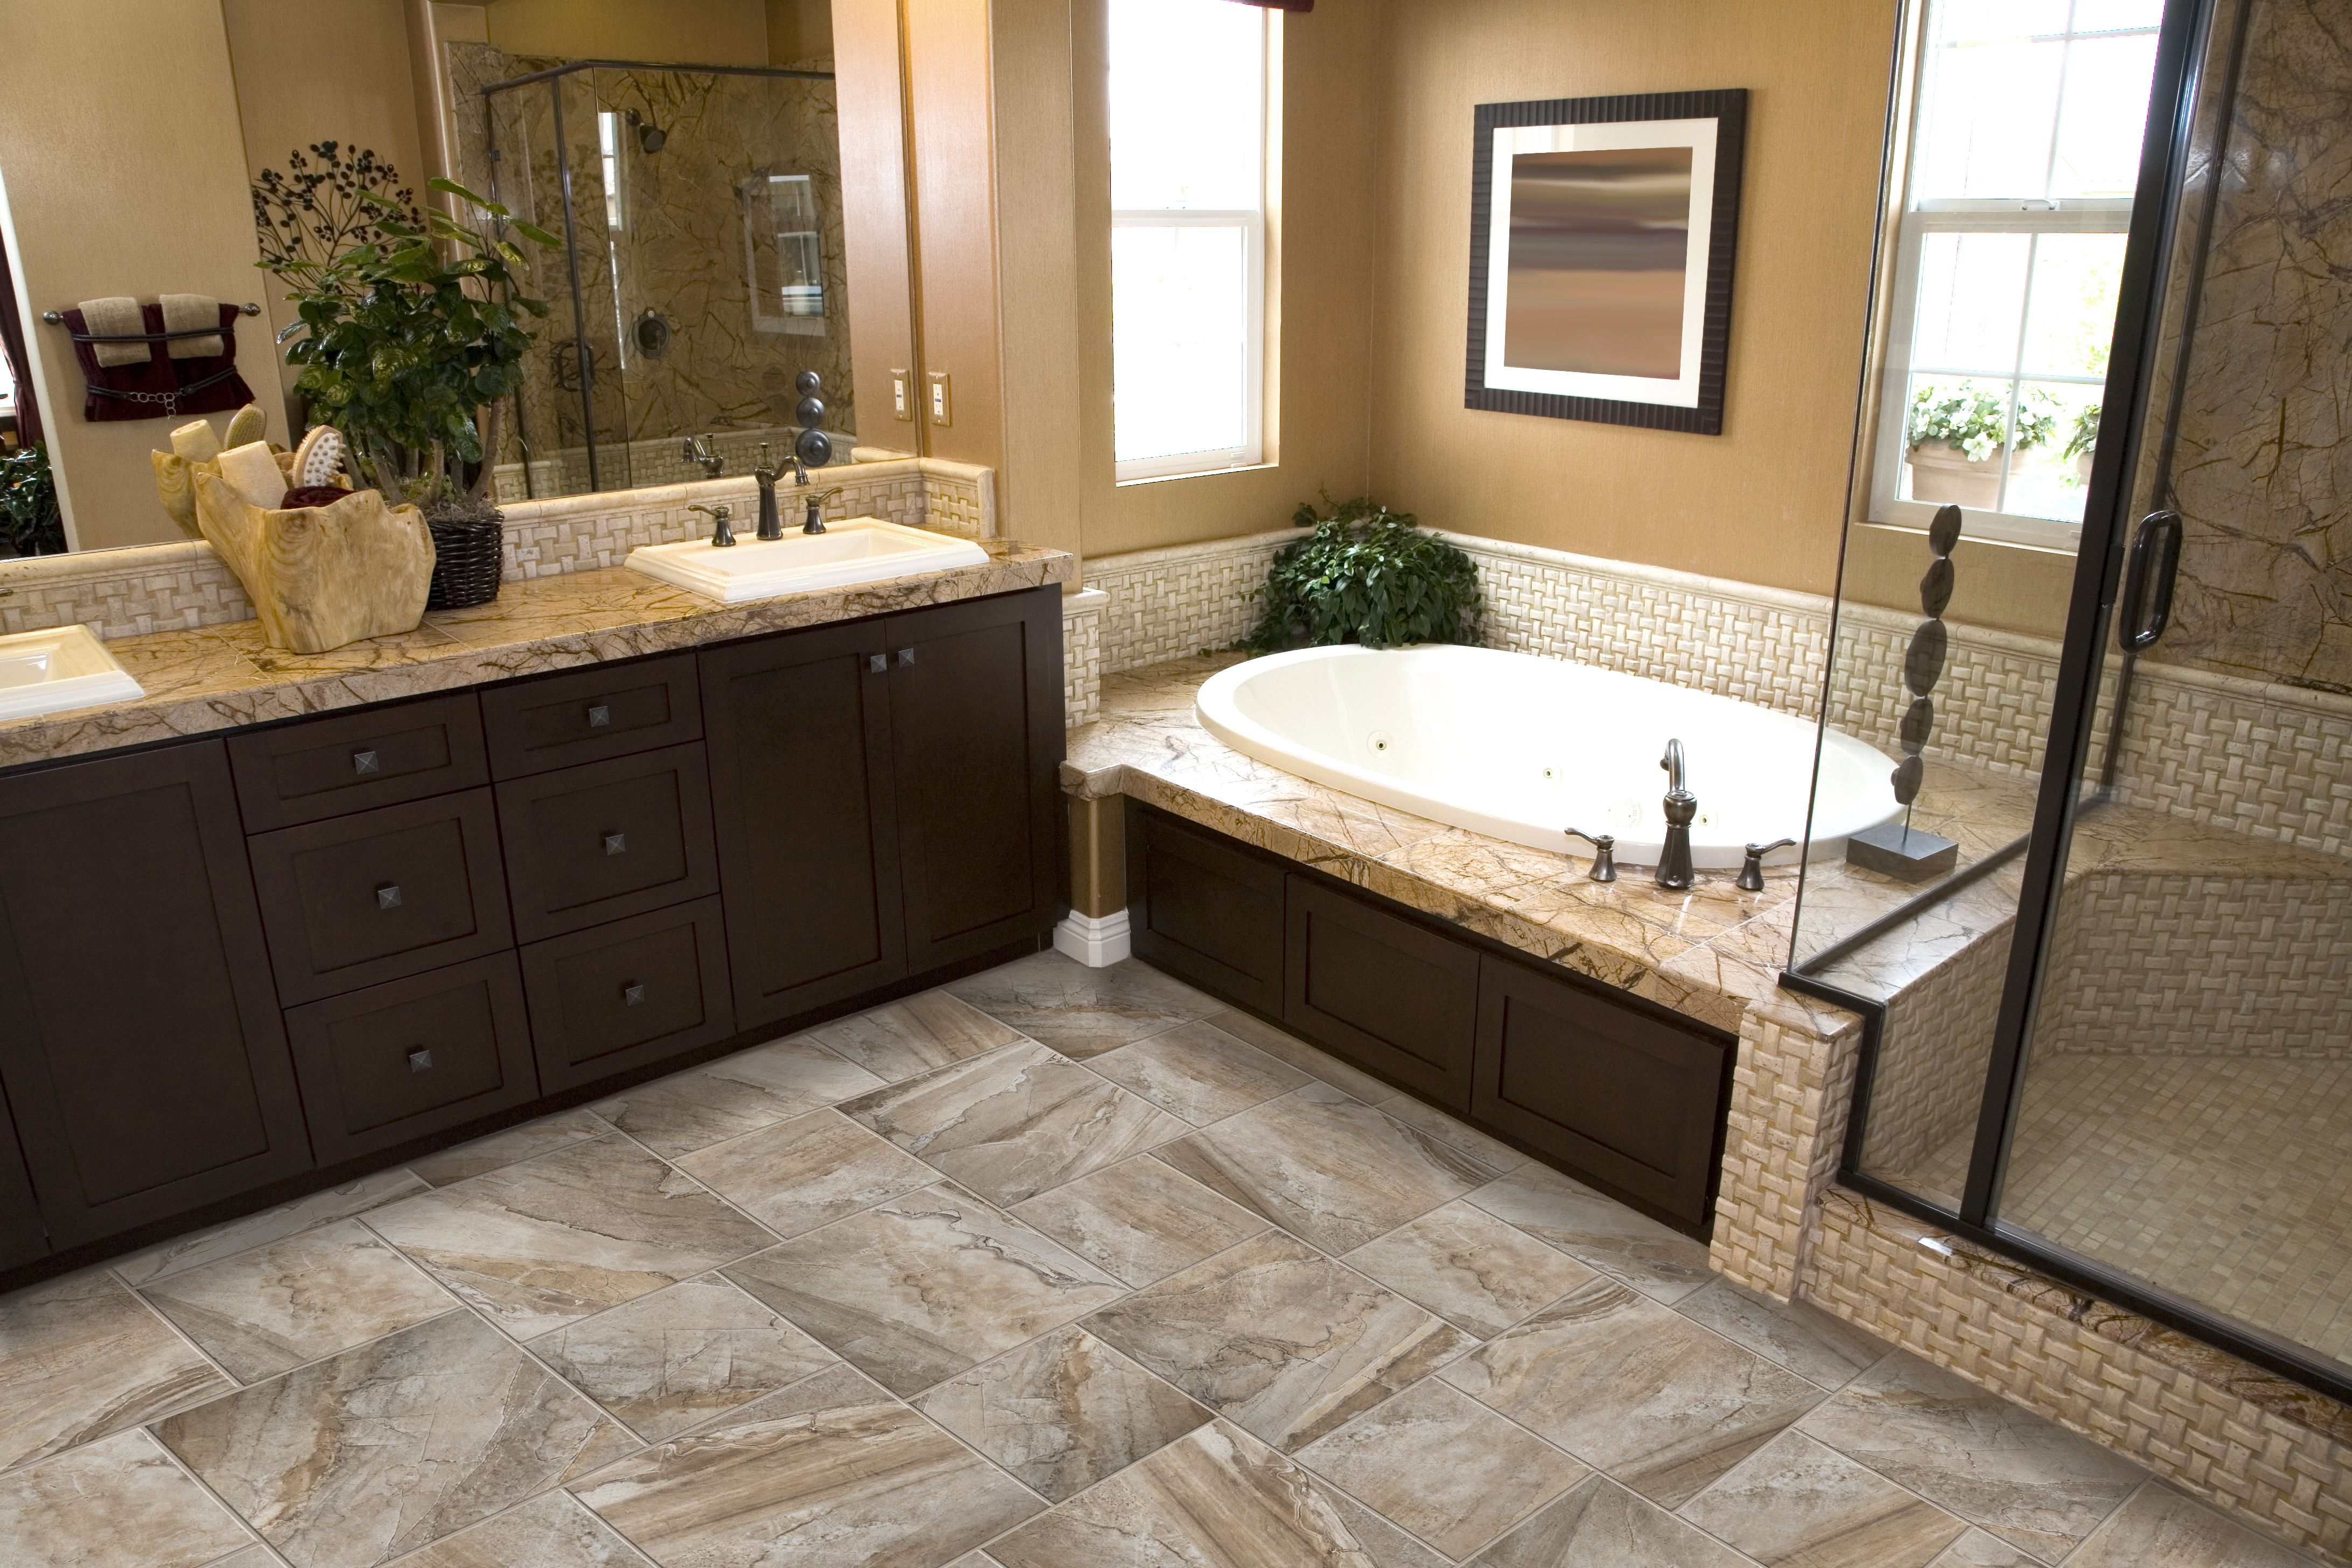 Full Size of Bathroom Design:new Bathroom Design Ideas Gray Budget And Tile  Lighting Makeover ...